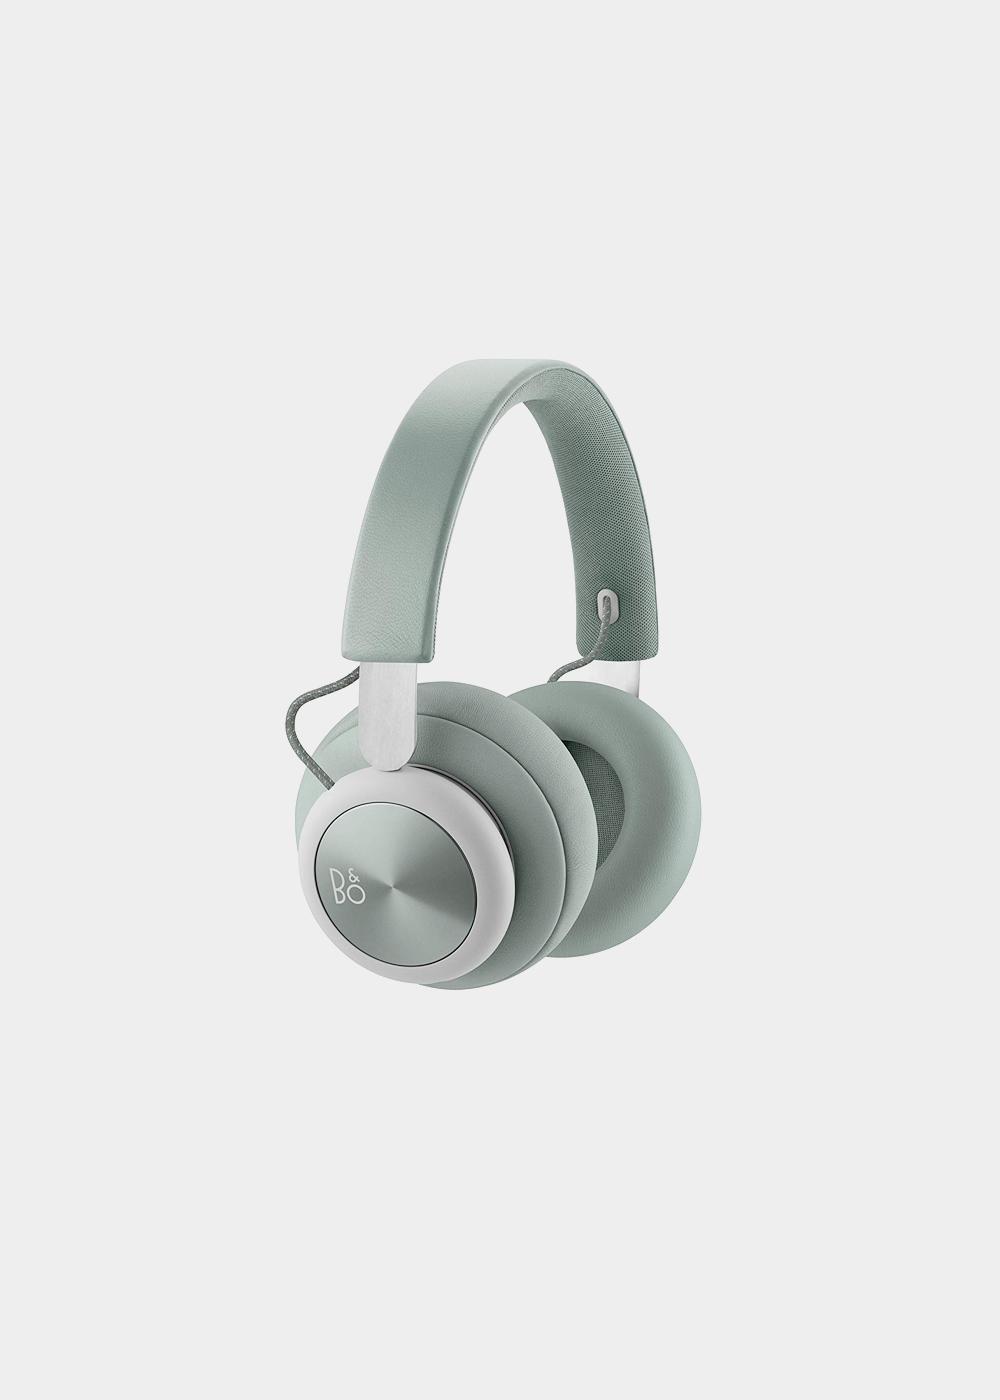 bc1073b100802b The Design Shop - Bang & Olufsen Beoplay H4 Wireless Headphones ...